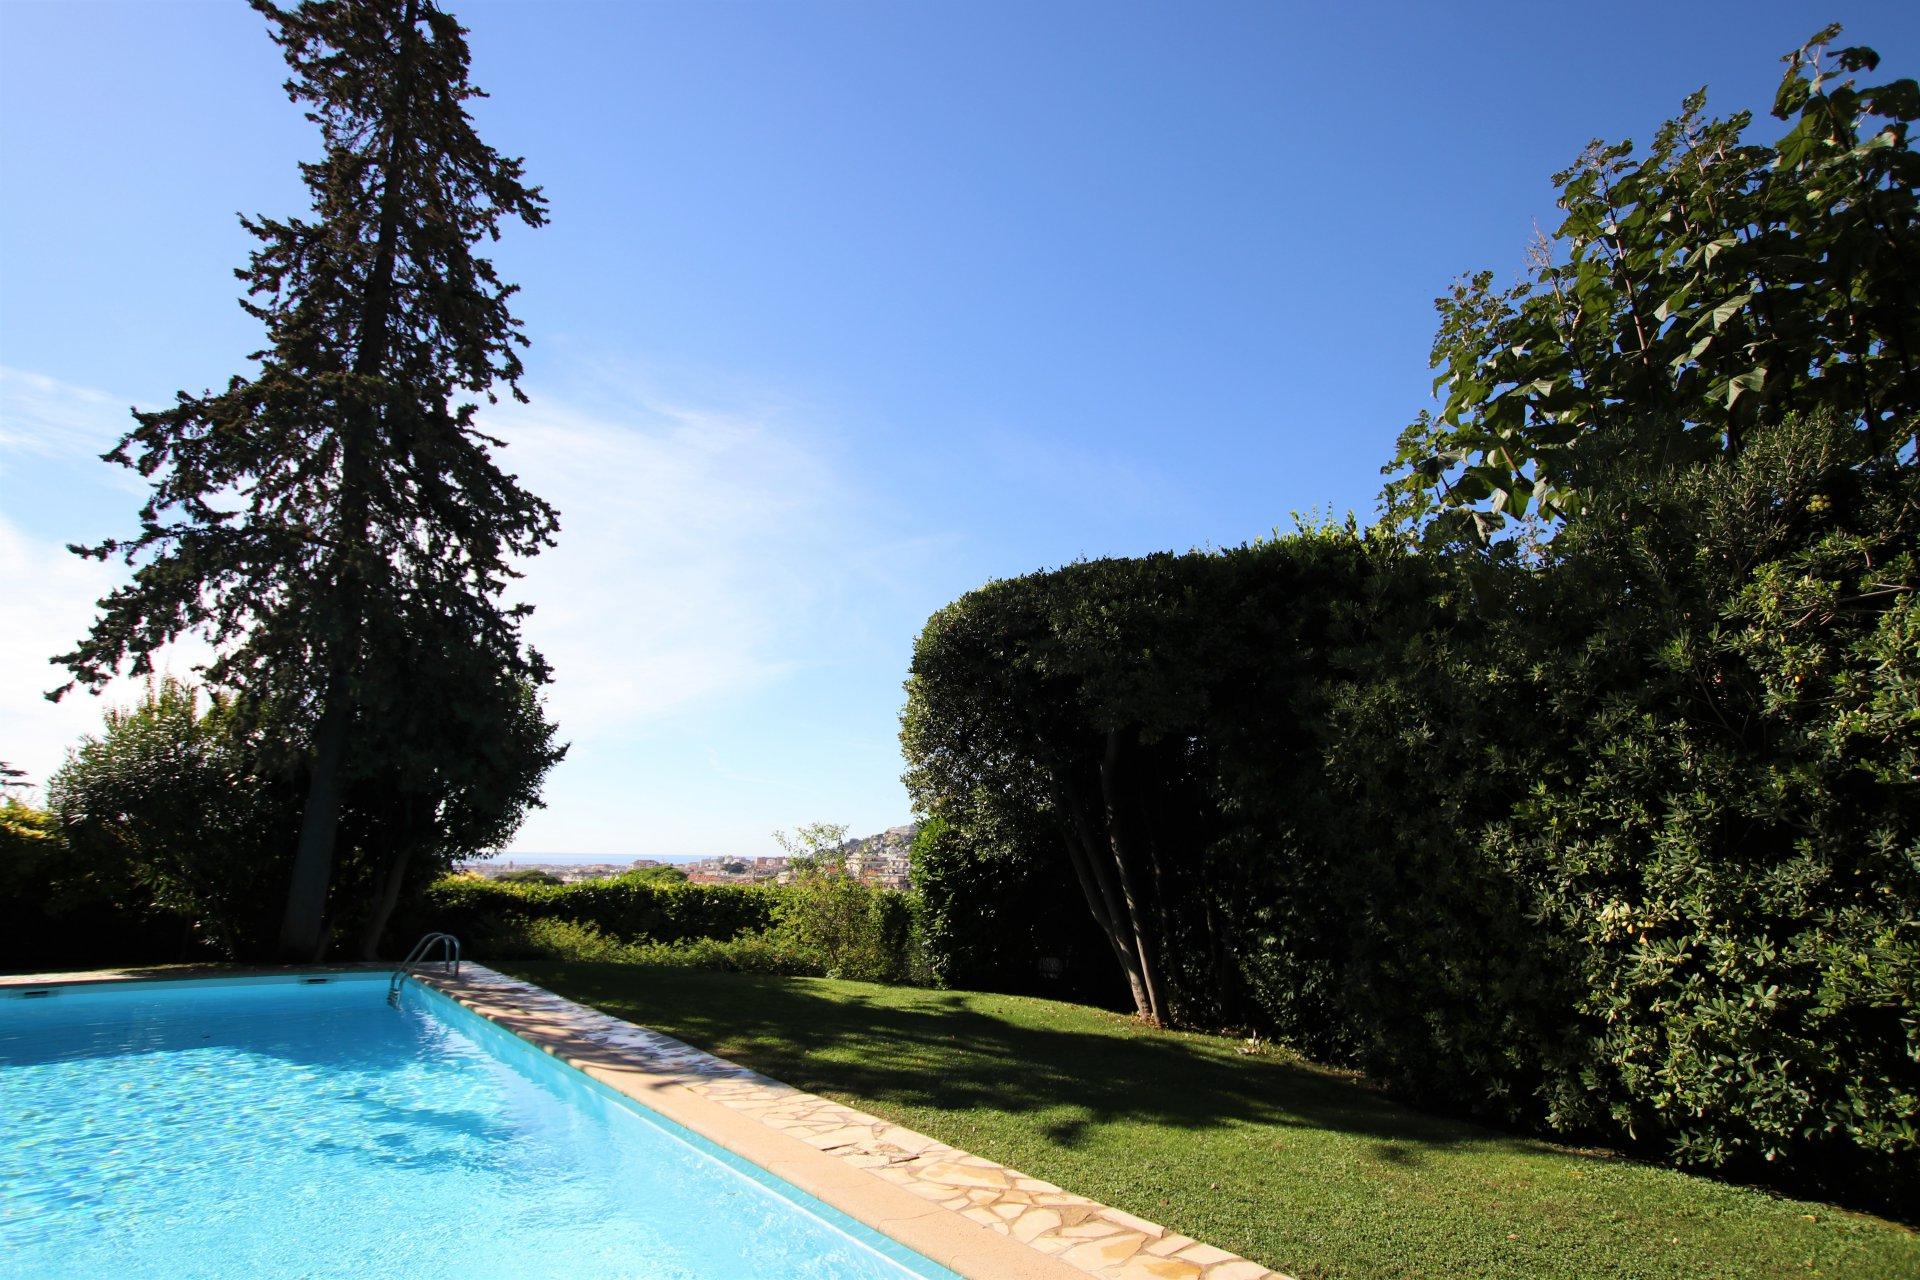 résidence piscine